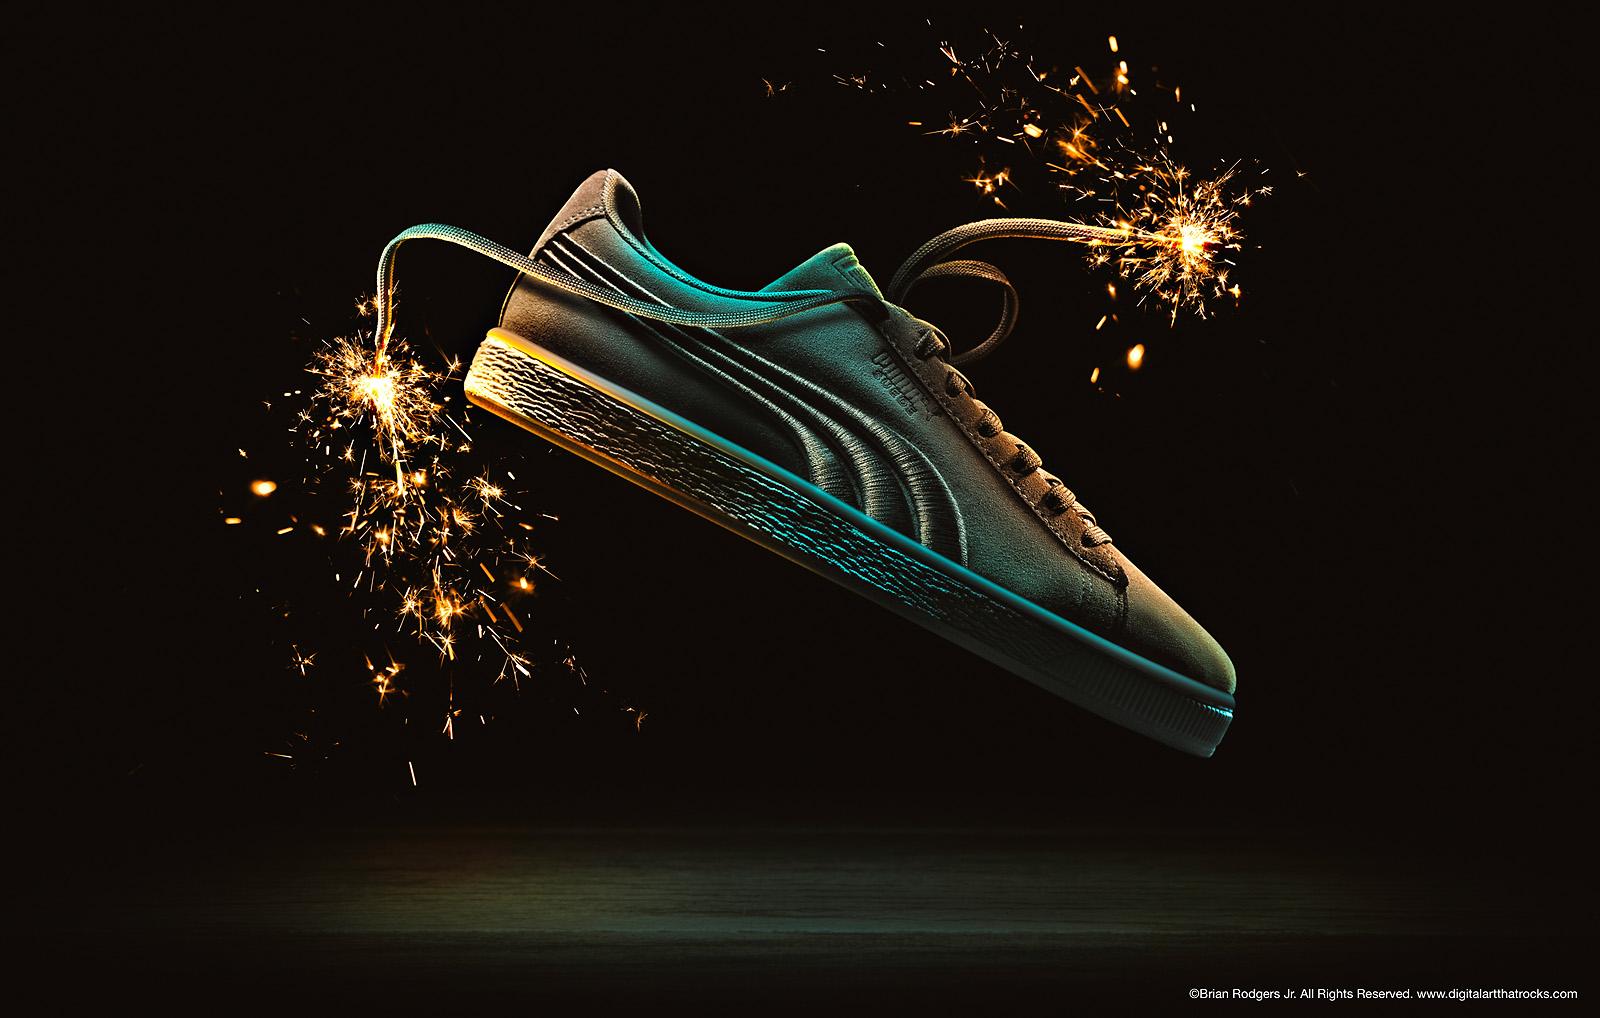 brian-rodgers-jr-commercial-photographer-digital-art-that-rocks-shoe-sparkler.jpg